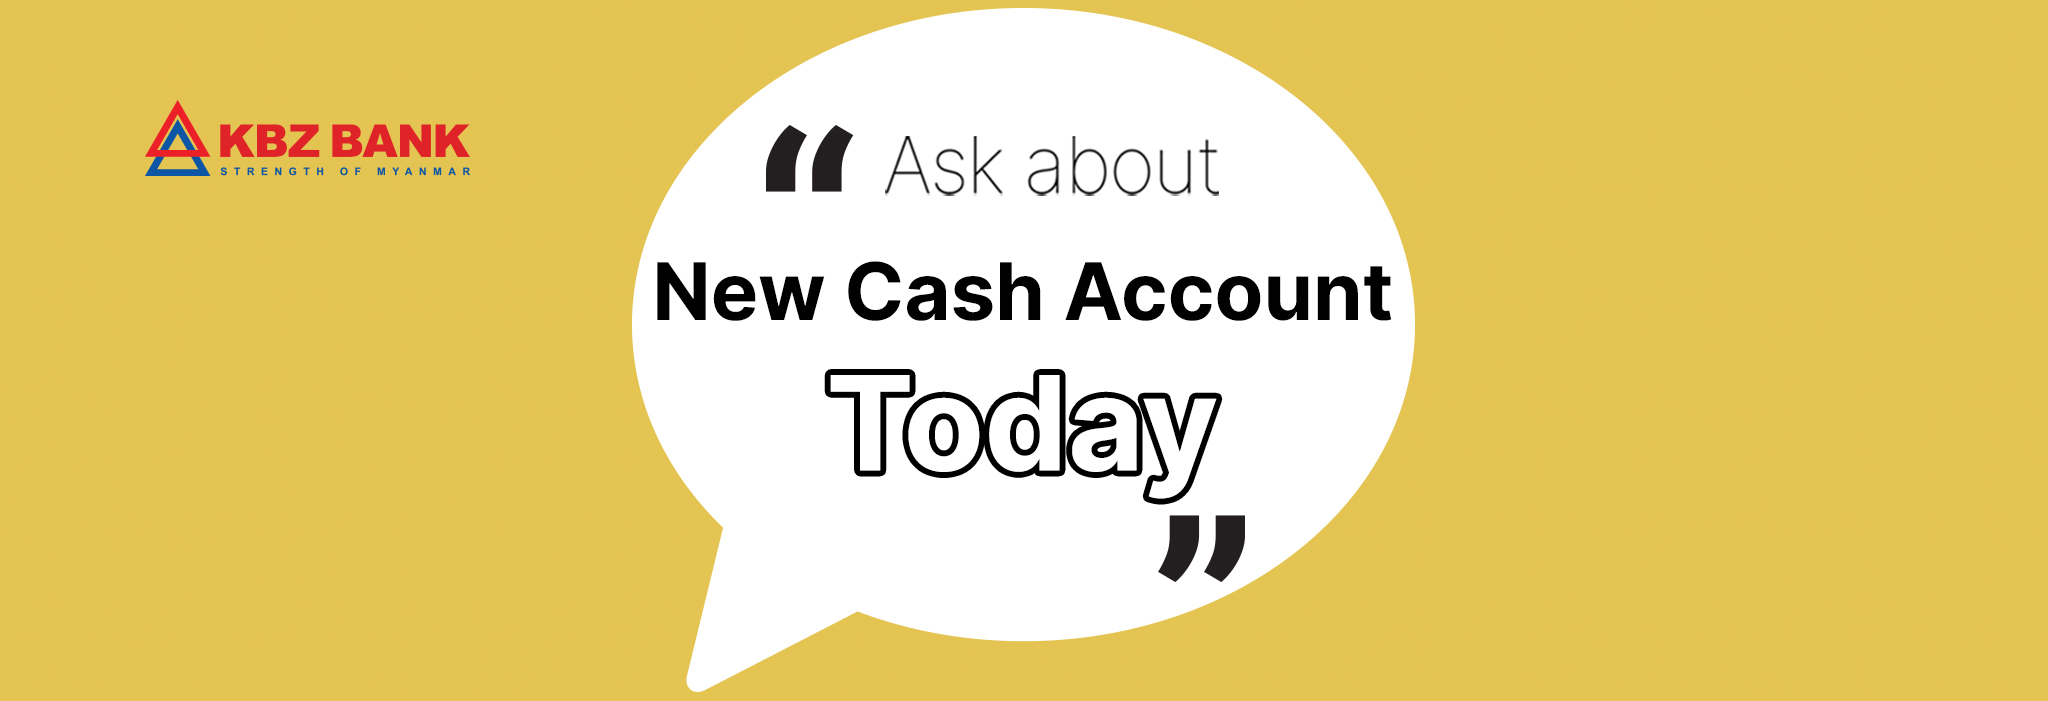 New Cash Account Saving